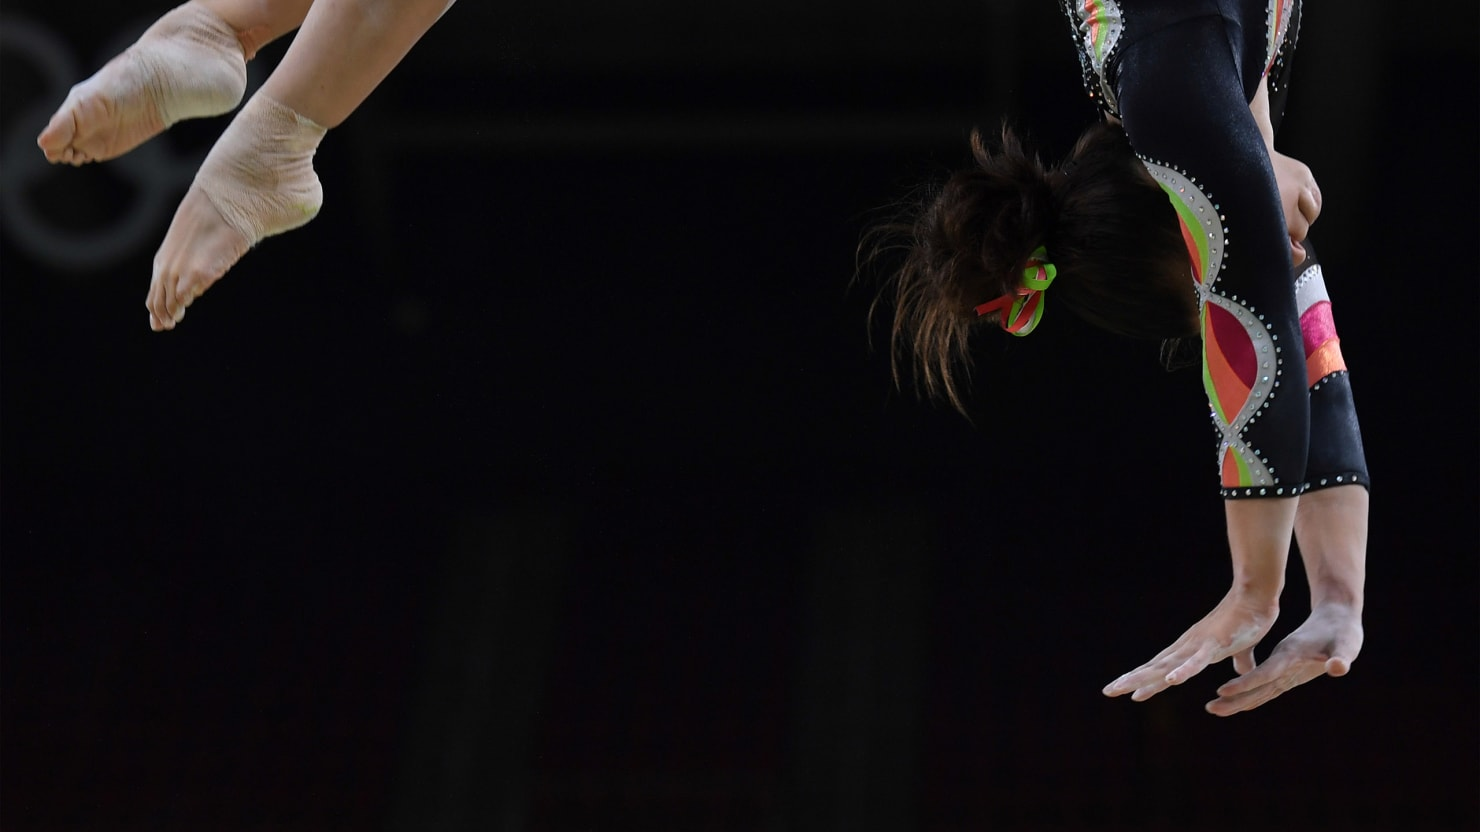 complete gymnastics 2016 rio olympics schedule